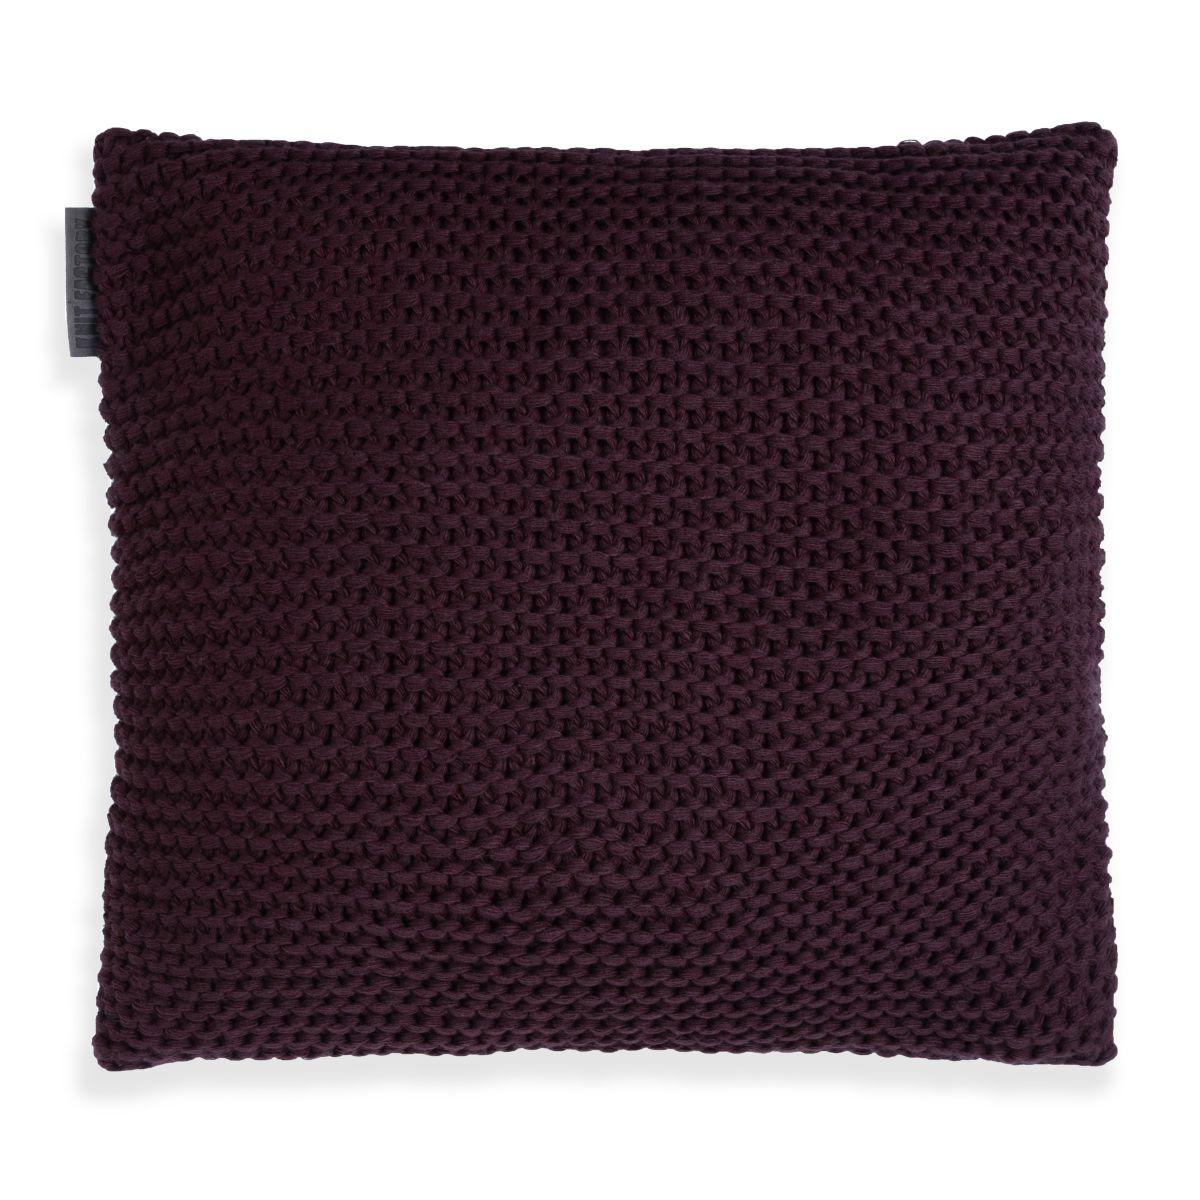 vinz cushion aubergine 50x50